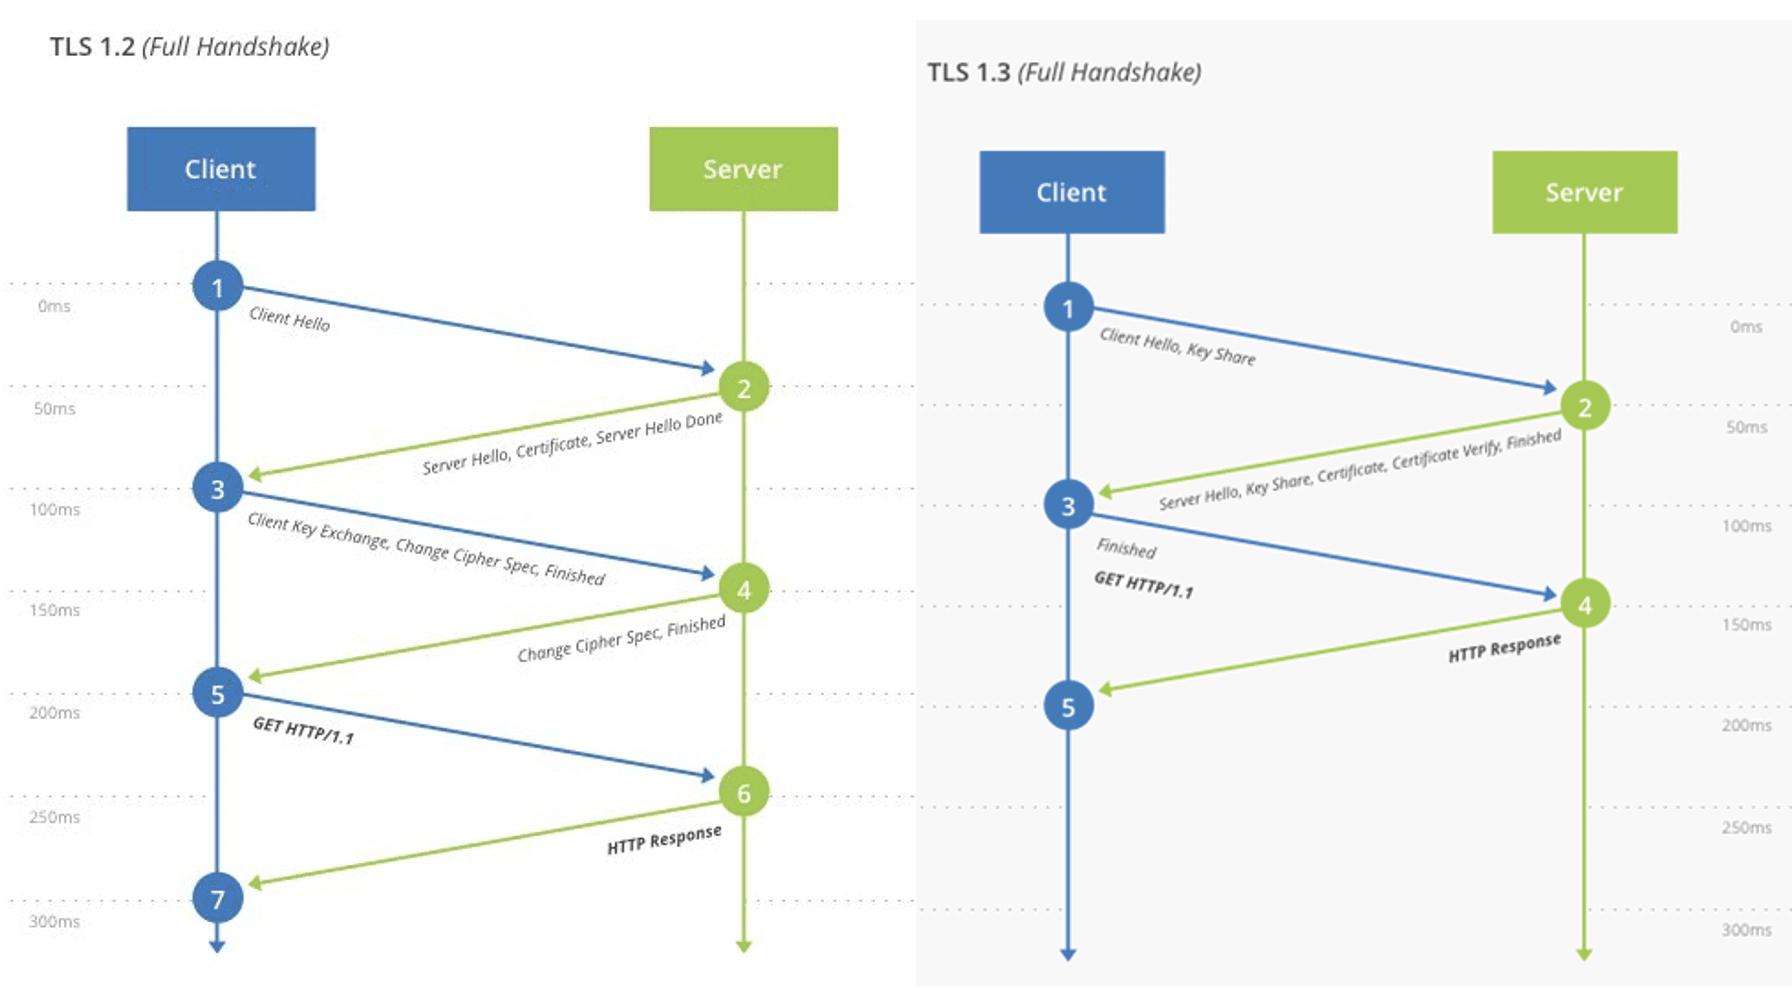 DAL TLS 1.2 AL TLS 1.3